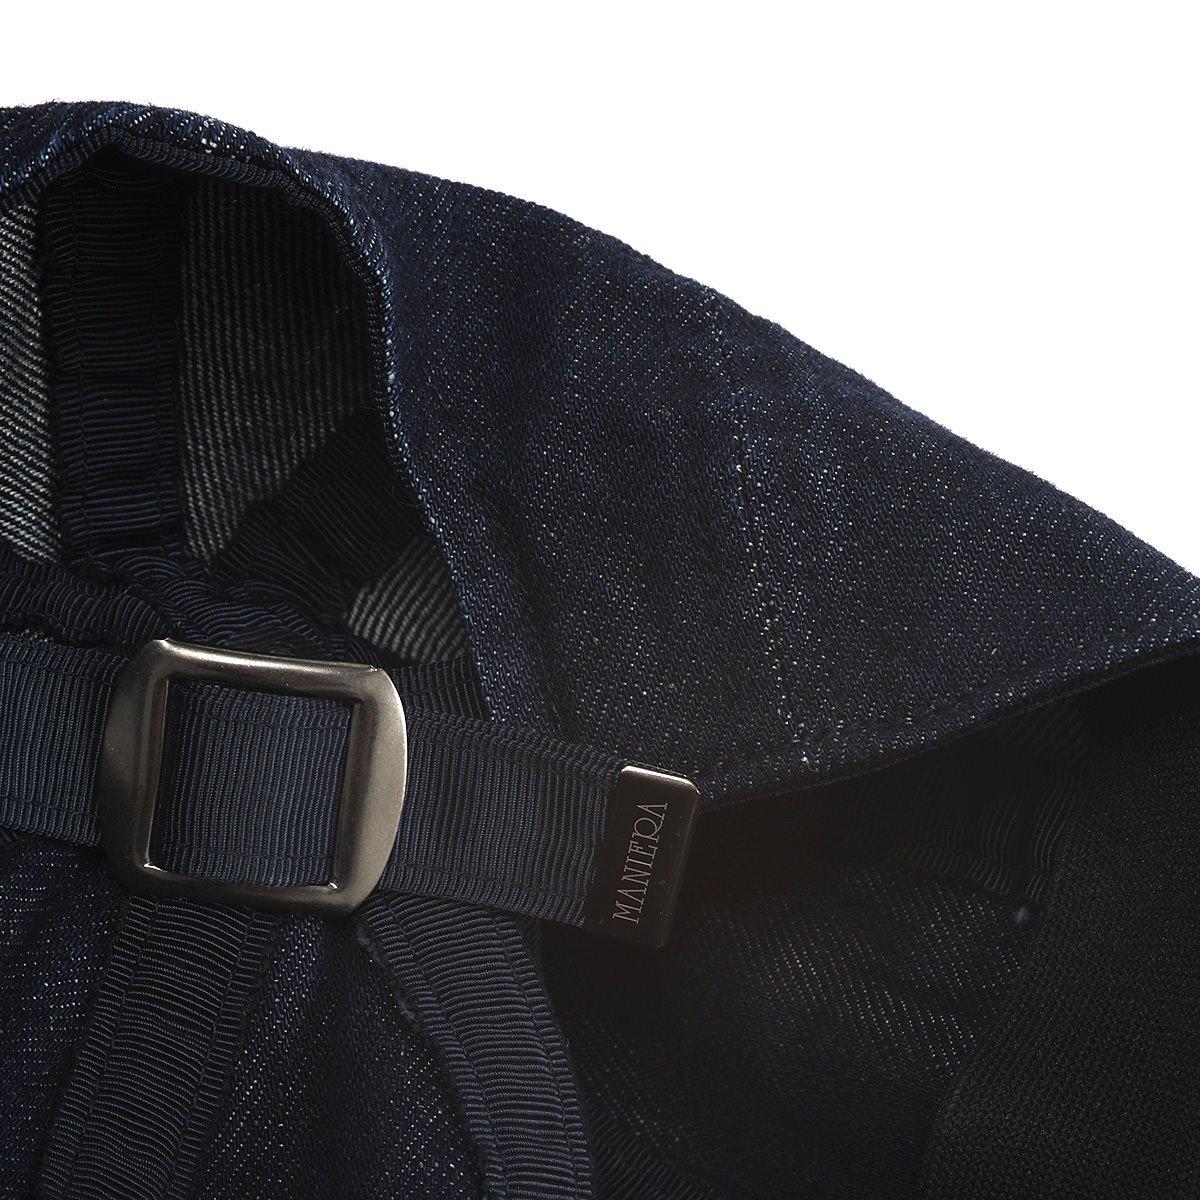 INDIGO 8PANEL CAP 詳細画像6